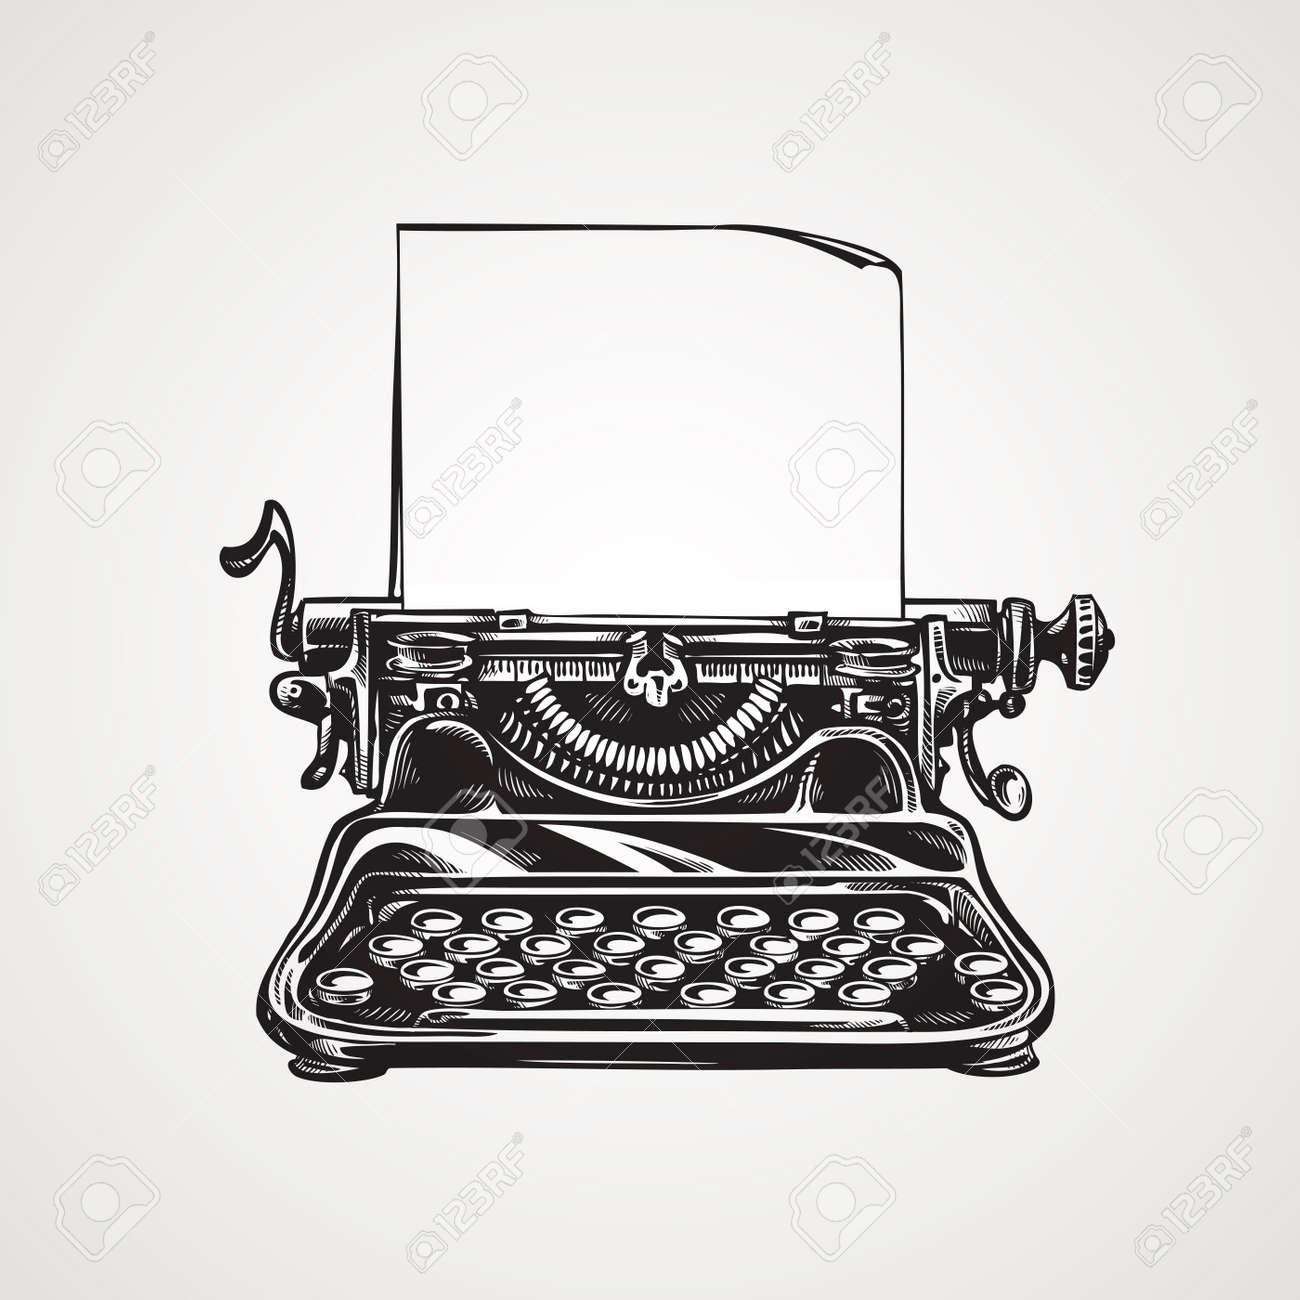 Vintage mechanical typewriter. retro sketch vector illustration - 67209088